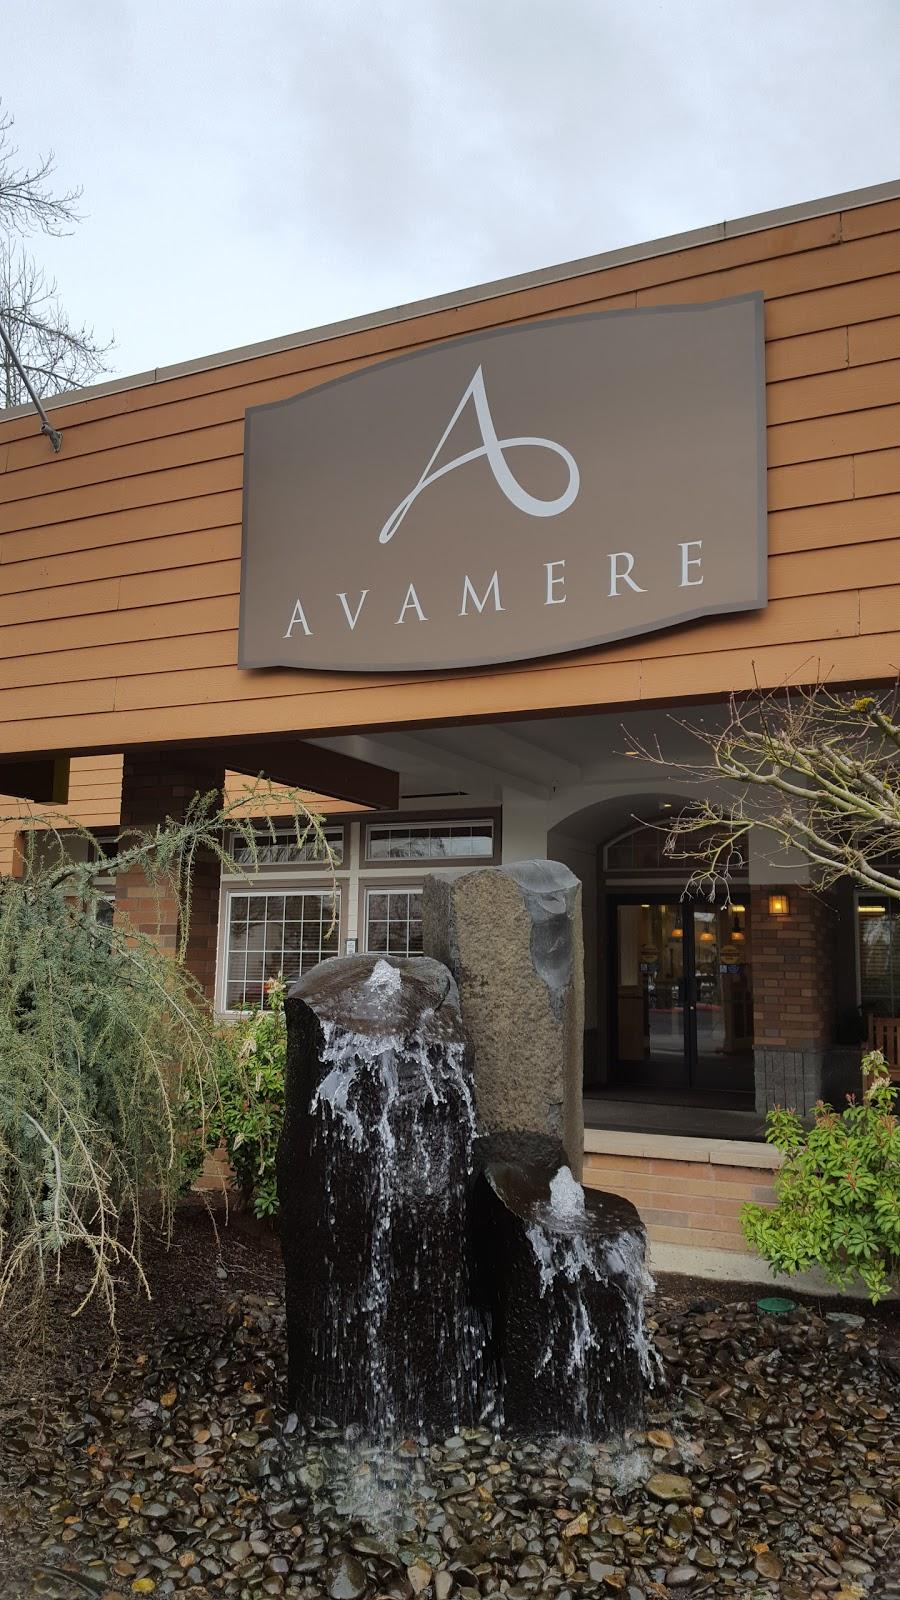 Avamere Rehabilitation of Oregon City - physiotherapist  | Photo 3 of 10 | Address: 1400 Division St, Oregon City, OR 97045, USA | Phone: (503) 656-0367